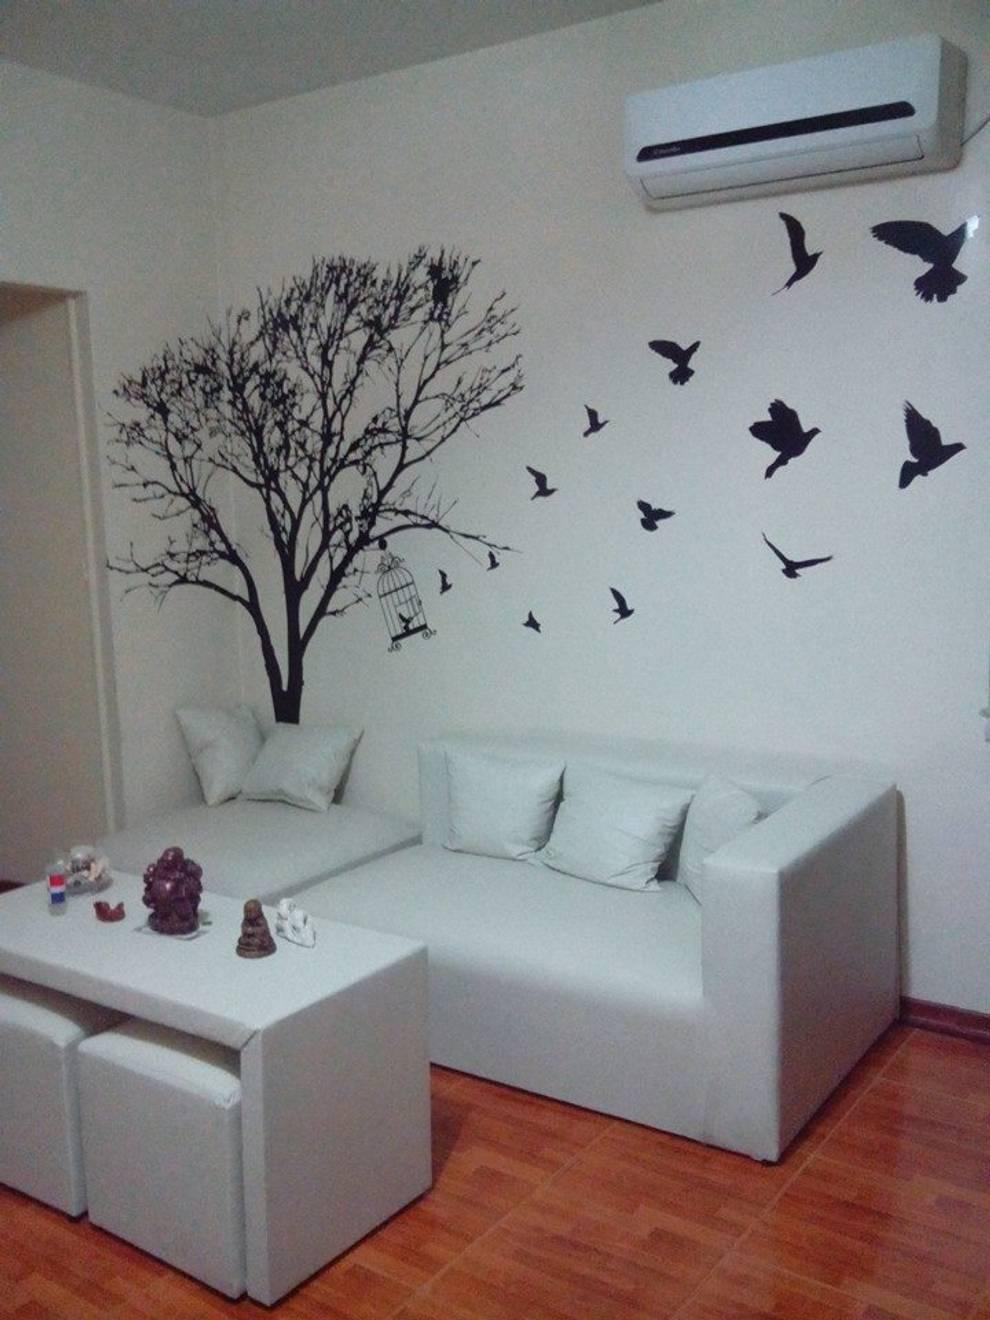 Vinilo Decorativo Arbol Naturaleza: Livings de estilo  por Vinilos Impacto Creativo